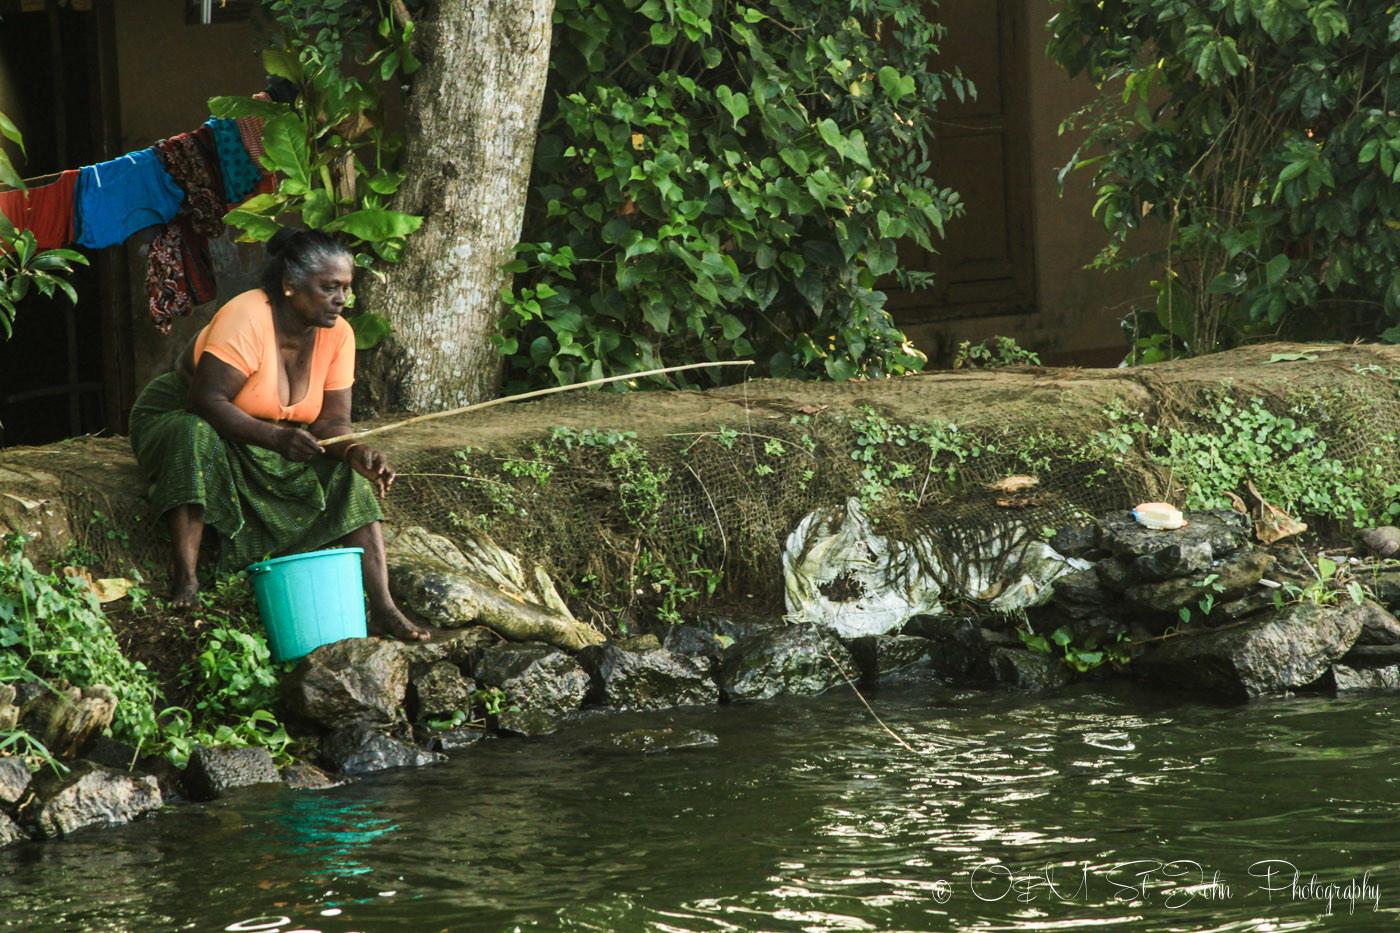 Woman fishing in the river. Kerala Backwaters. India